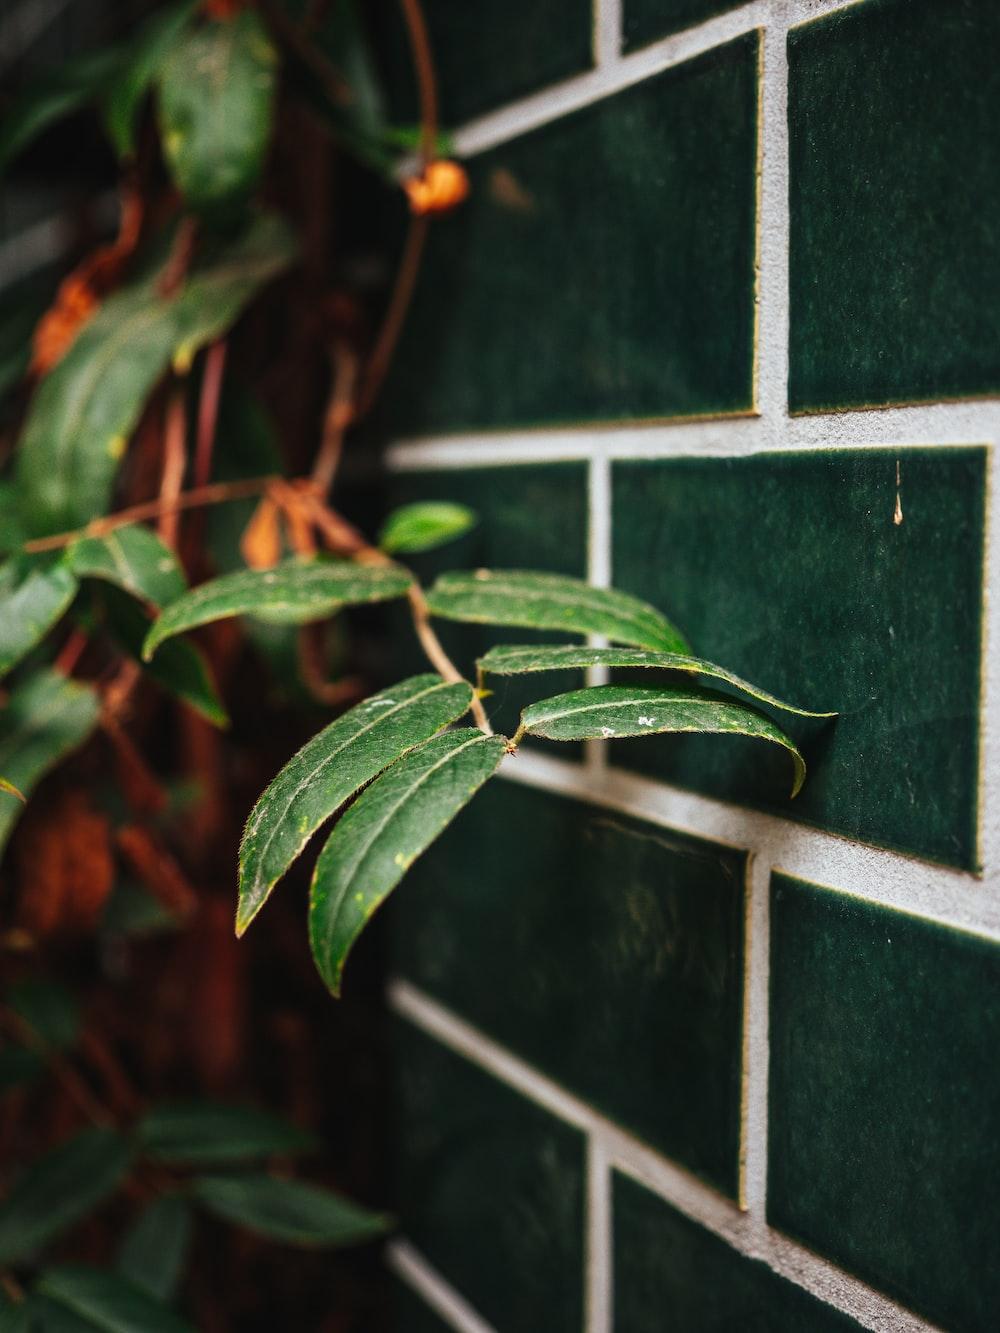 green leaves on black and white tile